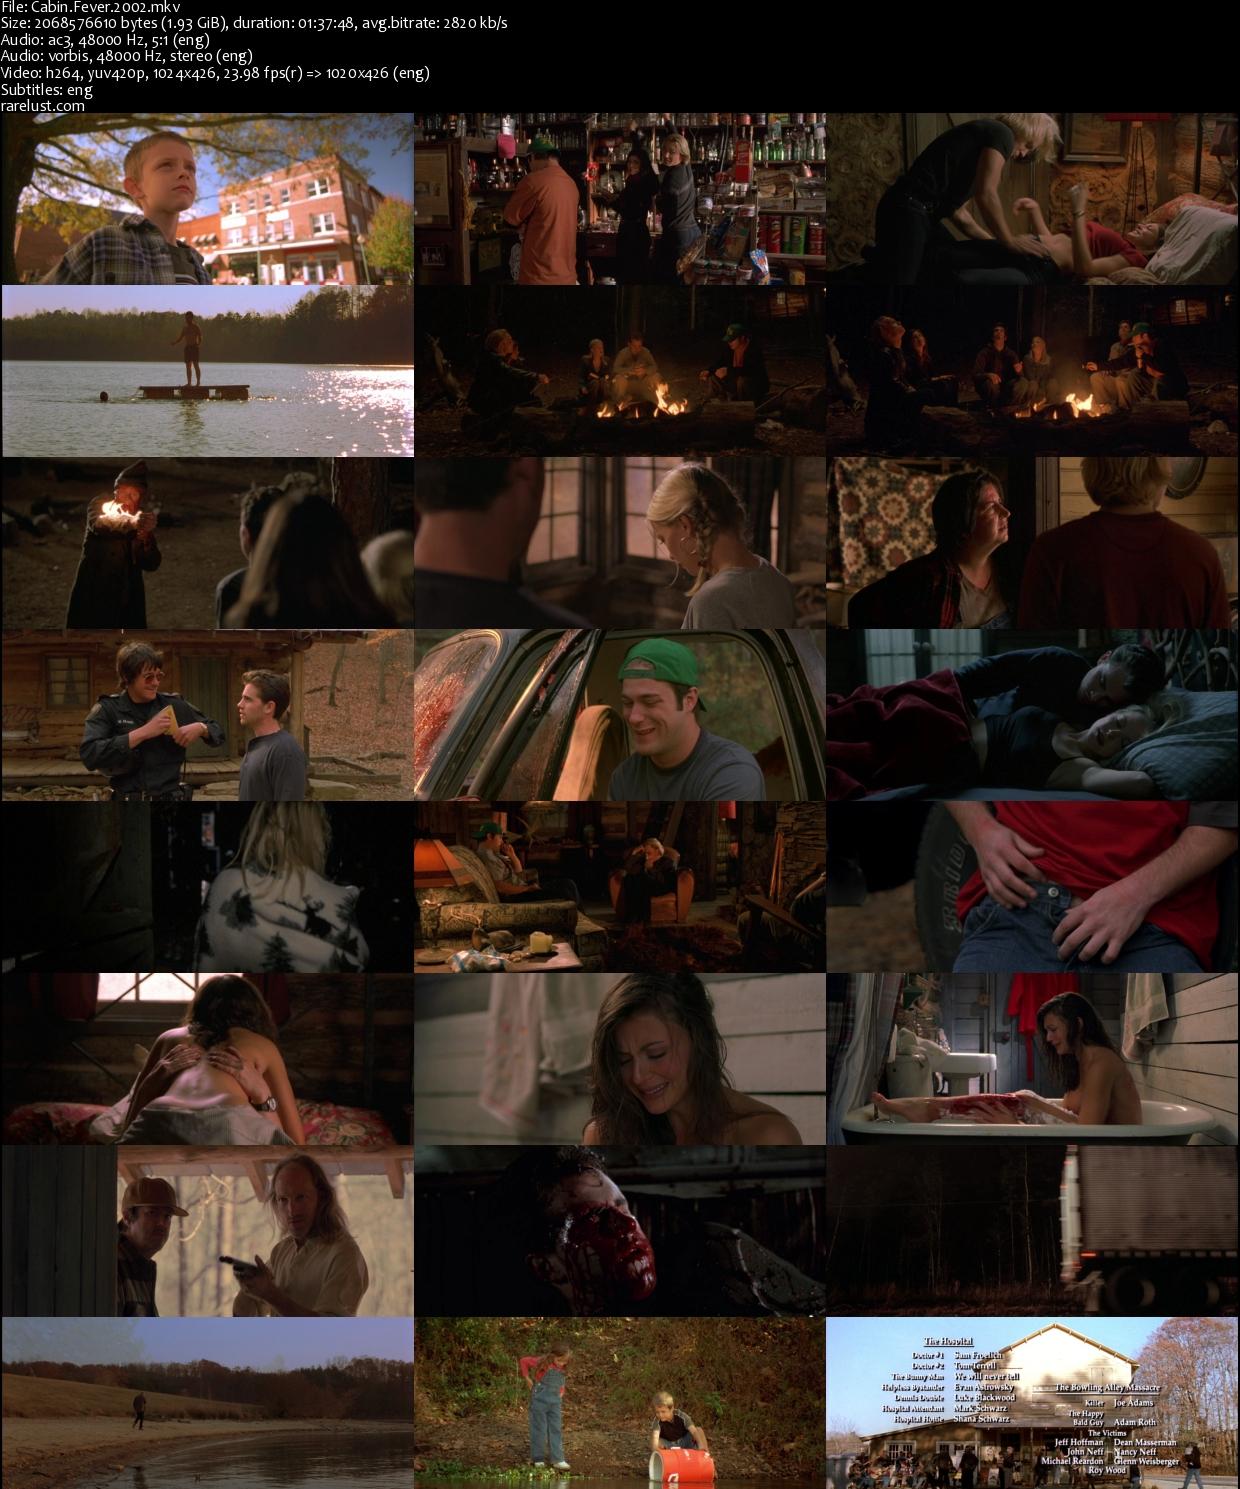 Cabin Fever (2002) BRrip [1.93GB]